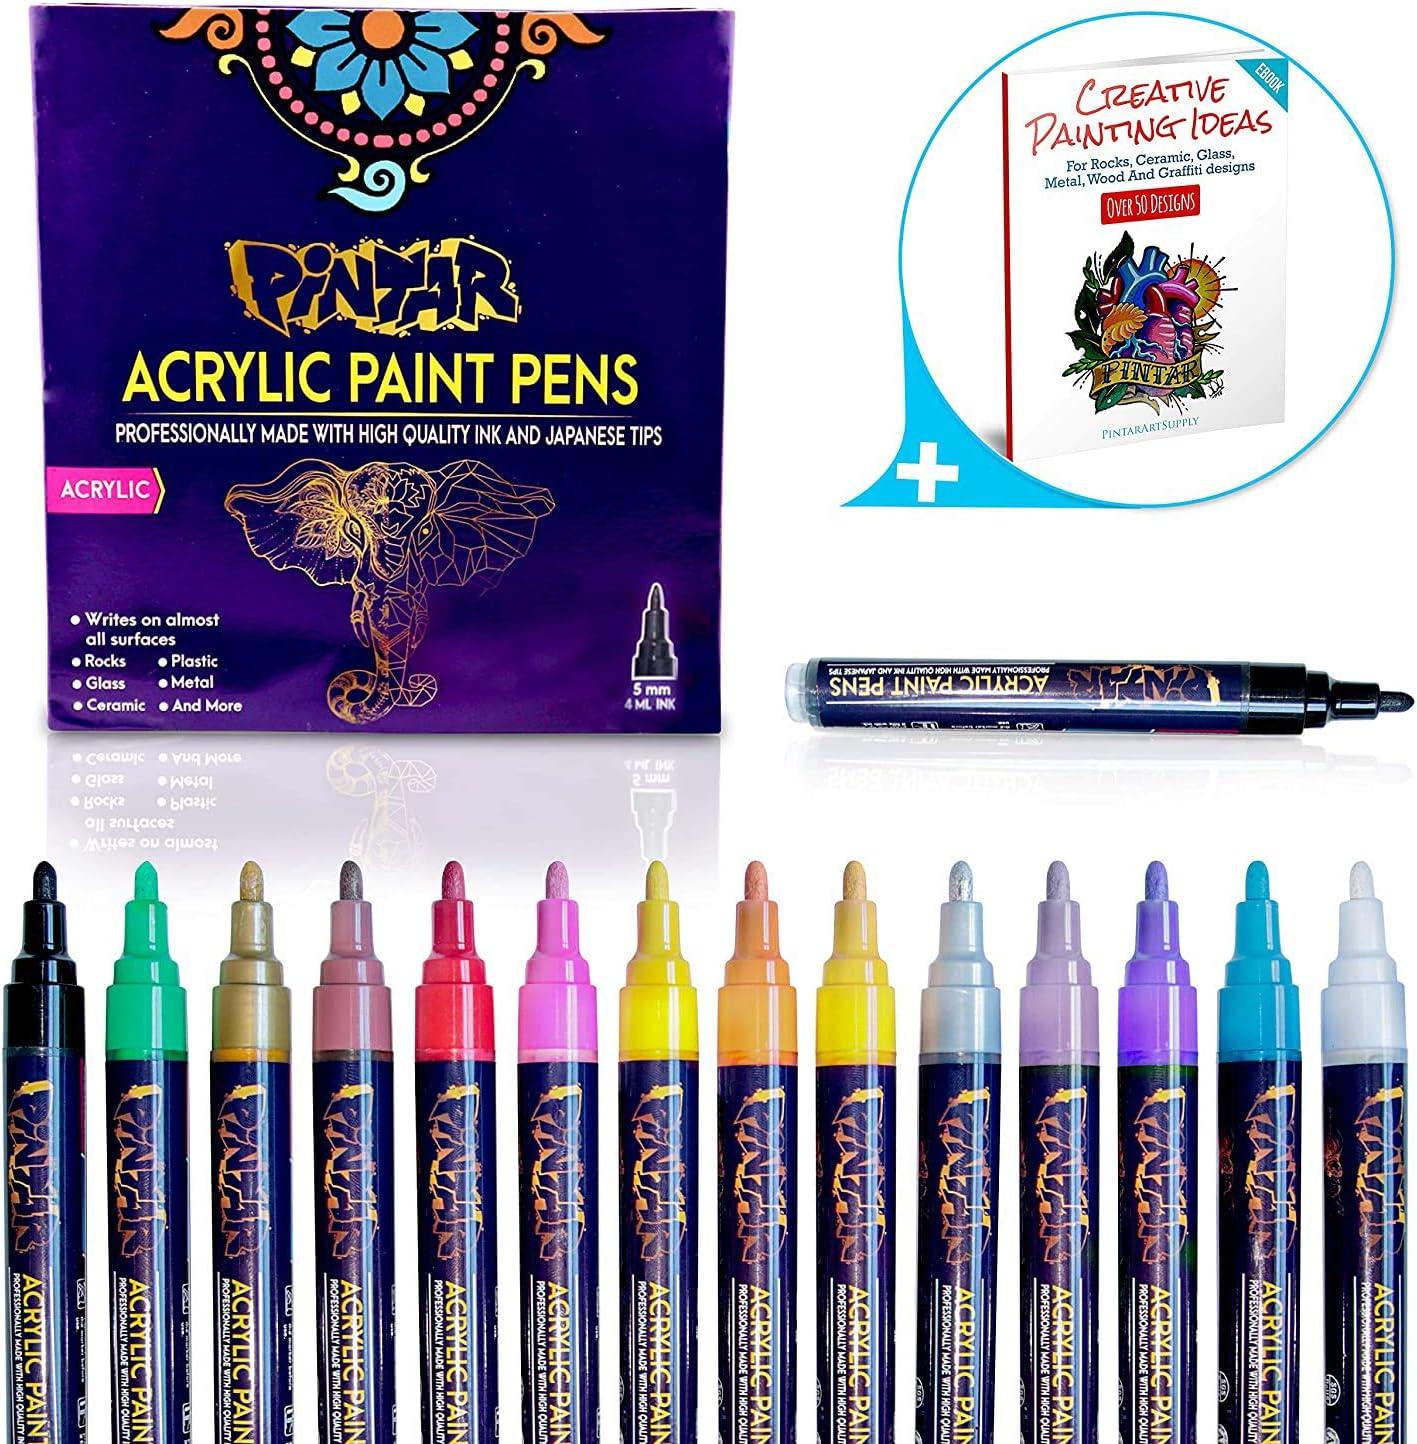 PINTAR Premium Acrylic Paint Pens - (14 Colors) Medium Tip Pens For Rock Painting, Ceramic Glass, Wood, Paper, Fabric & Porcelain, Water Resistant Paint Set, Surface Pen, Craft Supplies, DIY Project